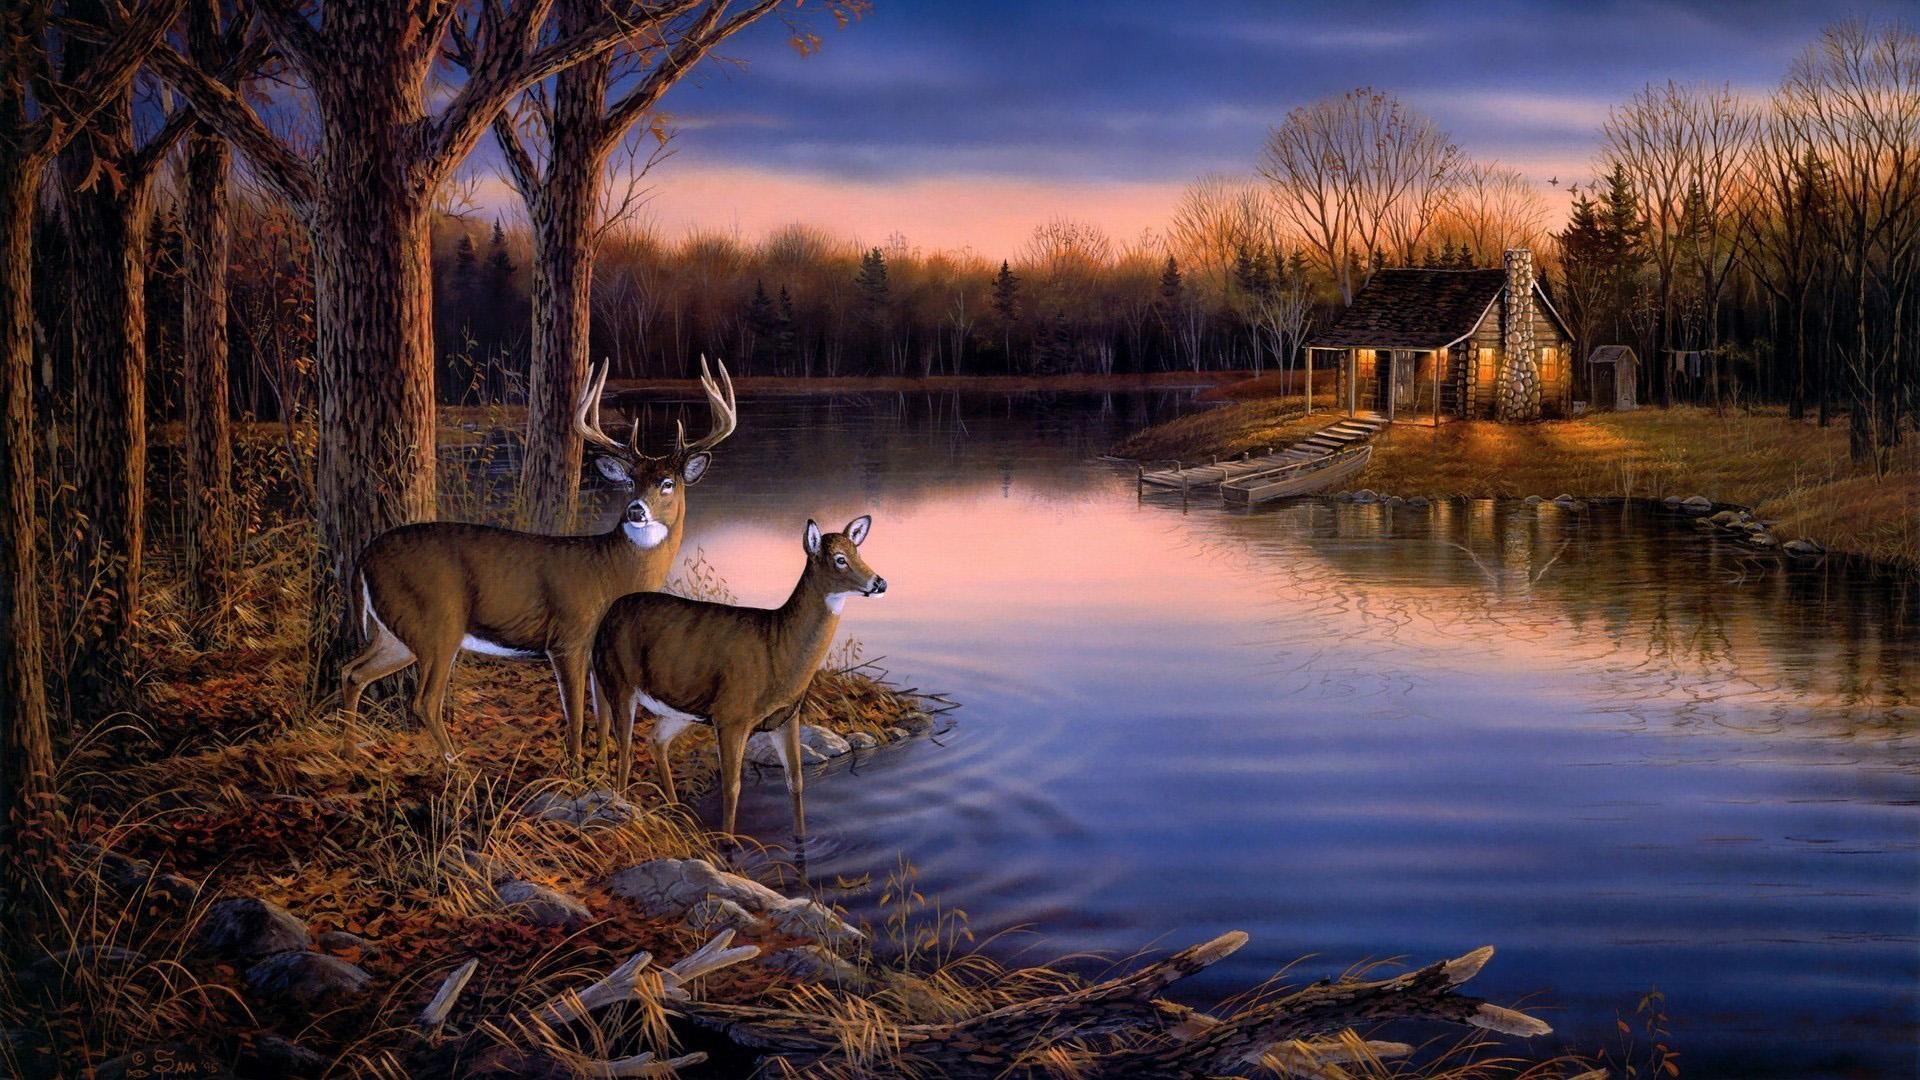 Deer Hunting Wallpaper Border landscape wallpaper Picture 1920x1080